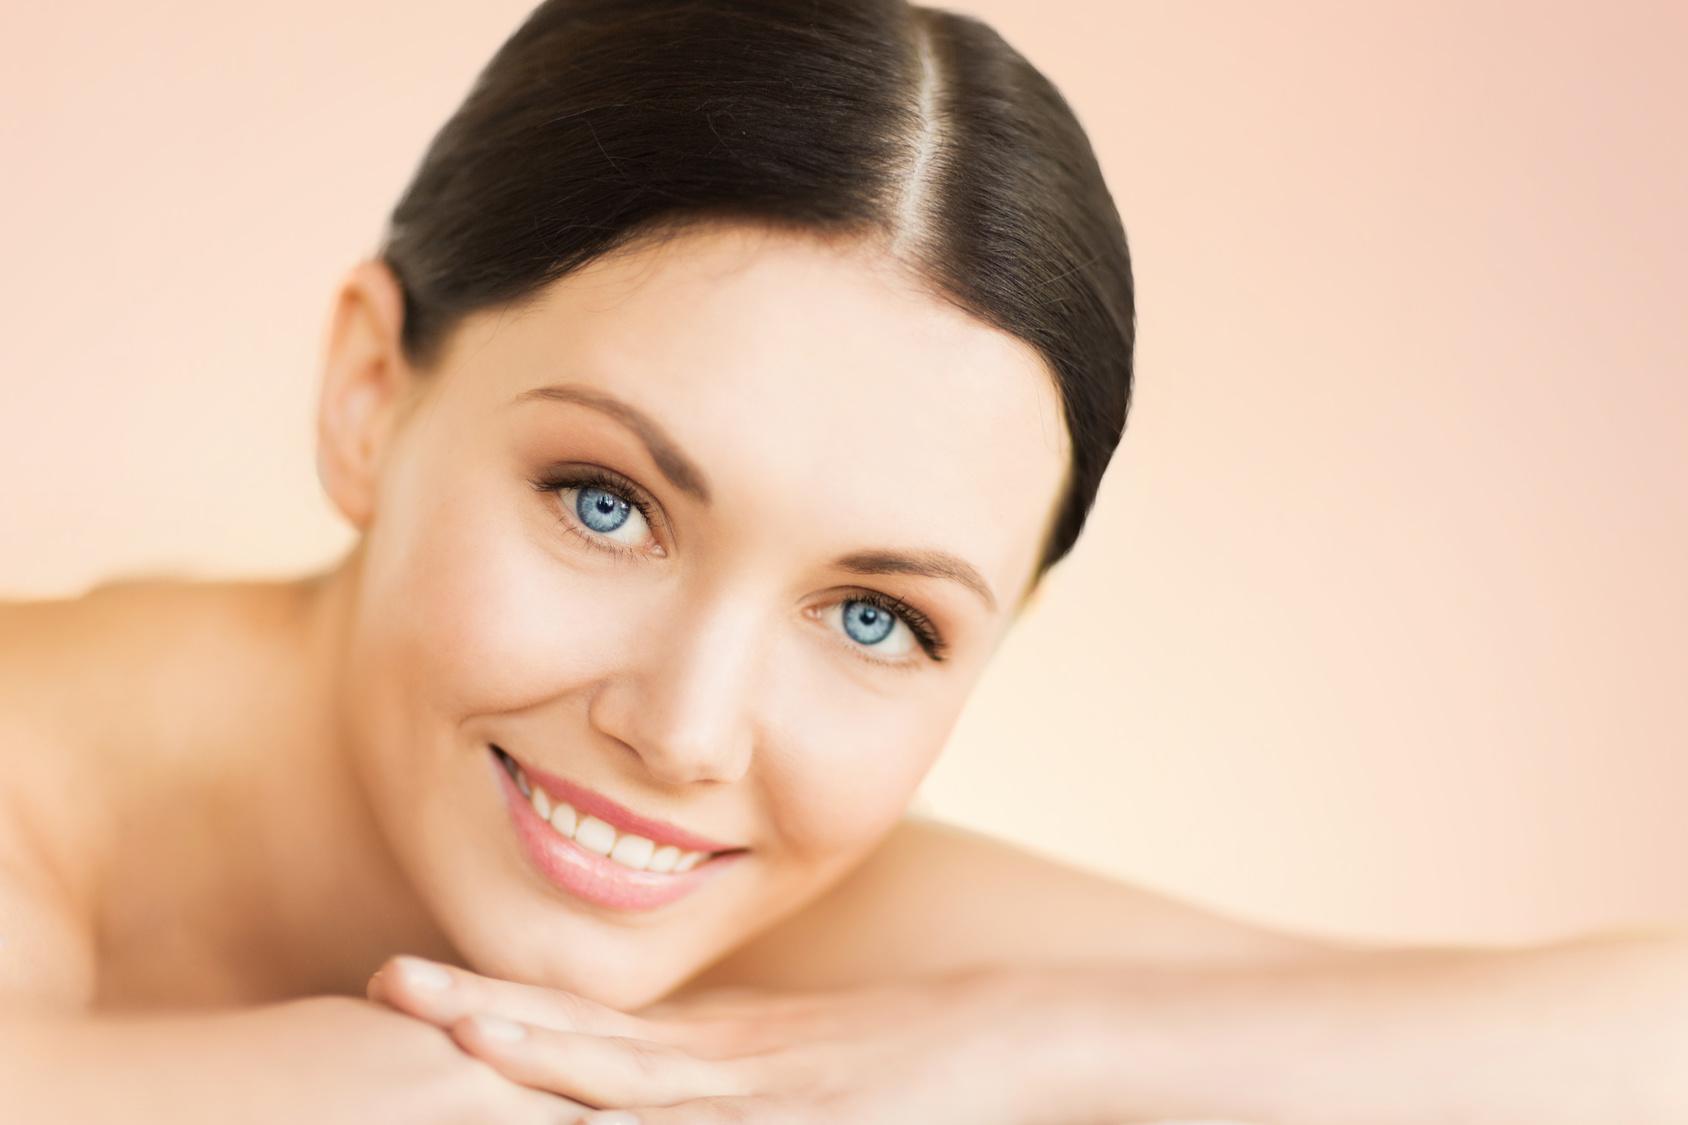 dermatologia estetica allergan